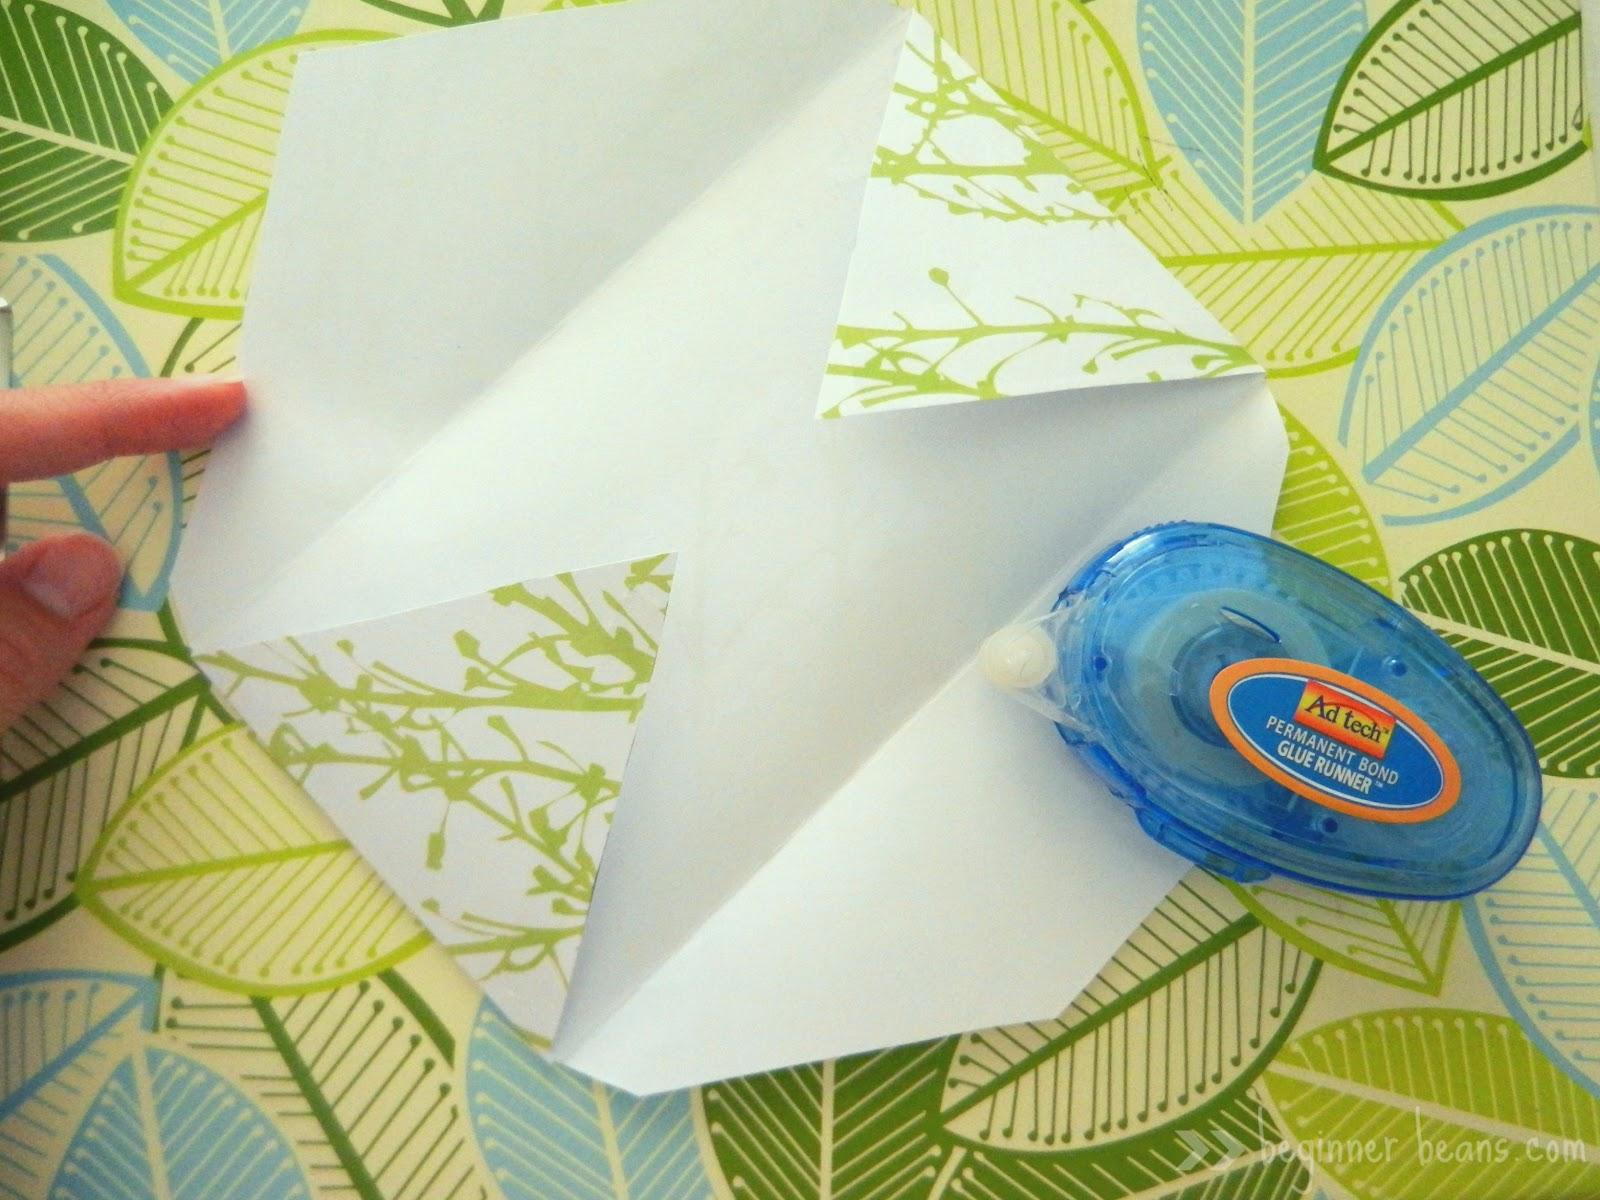 Scrapbook paper envelope template - Making Your Own Cash Envelopes